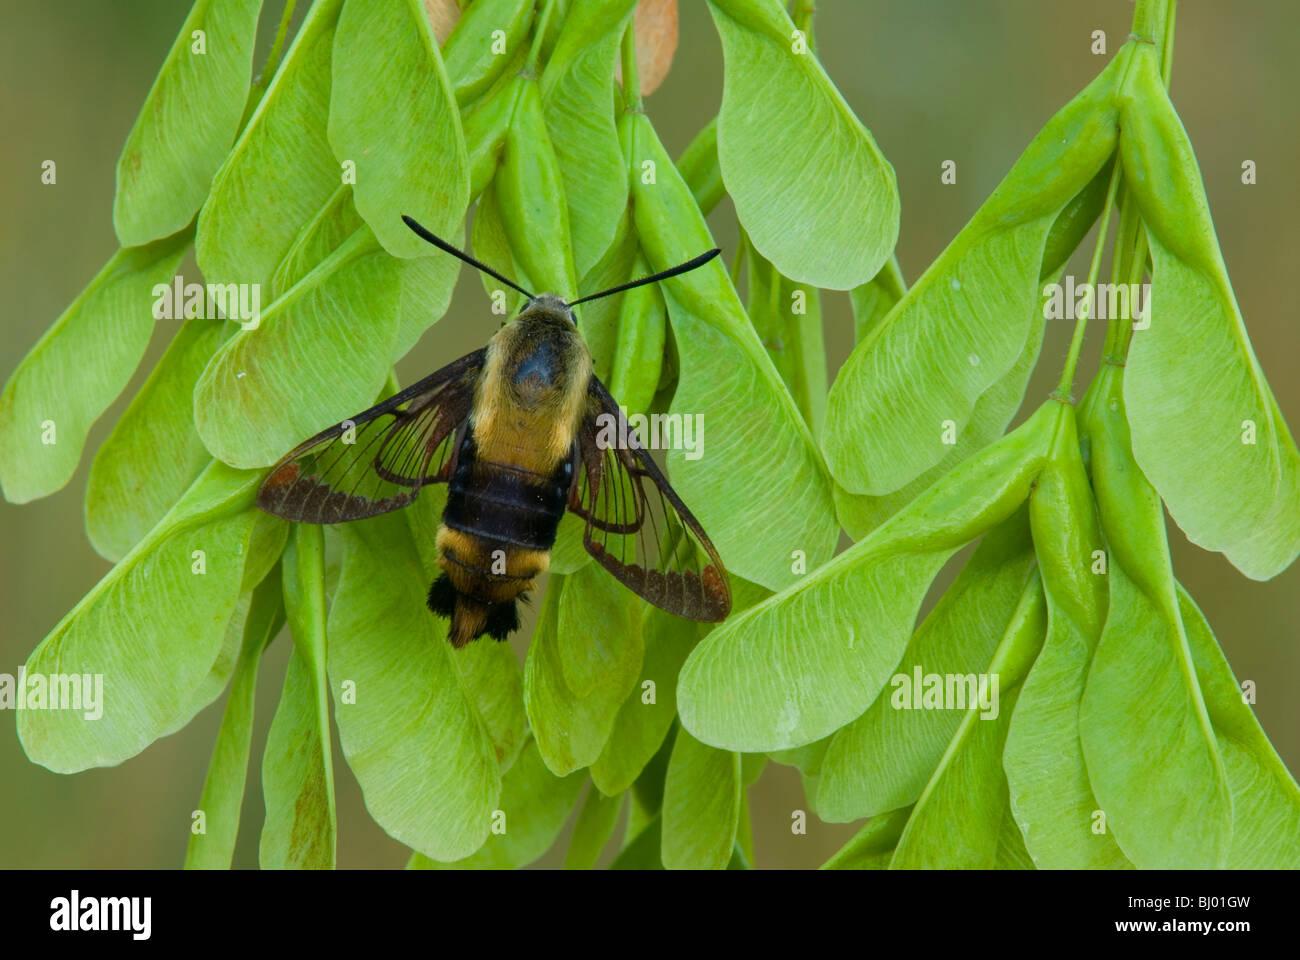 Hummingbird Moth Hemaris thysbe sésie commune sur Ashleaf Maple Seeds est des Etats-Unis, par aller Moody/Dembinsky Photo Stock